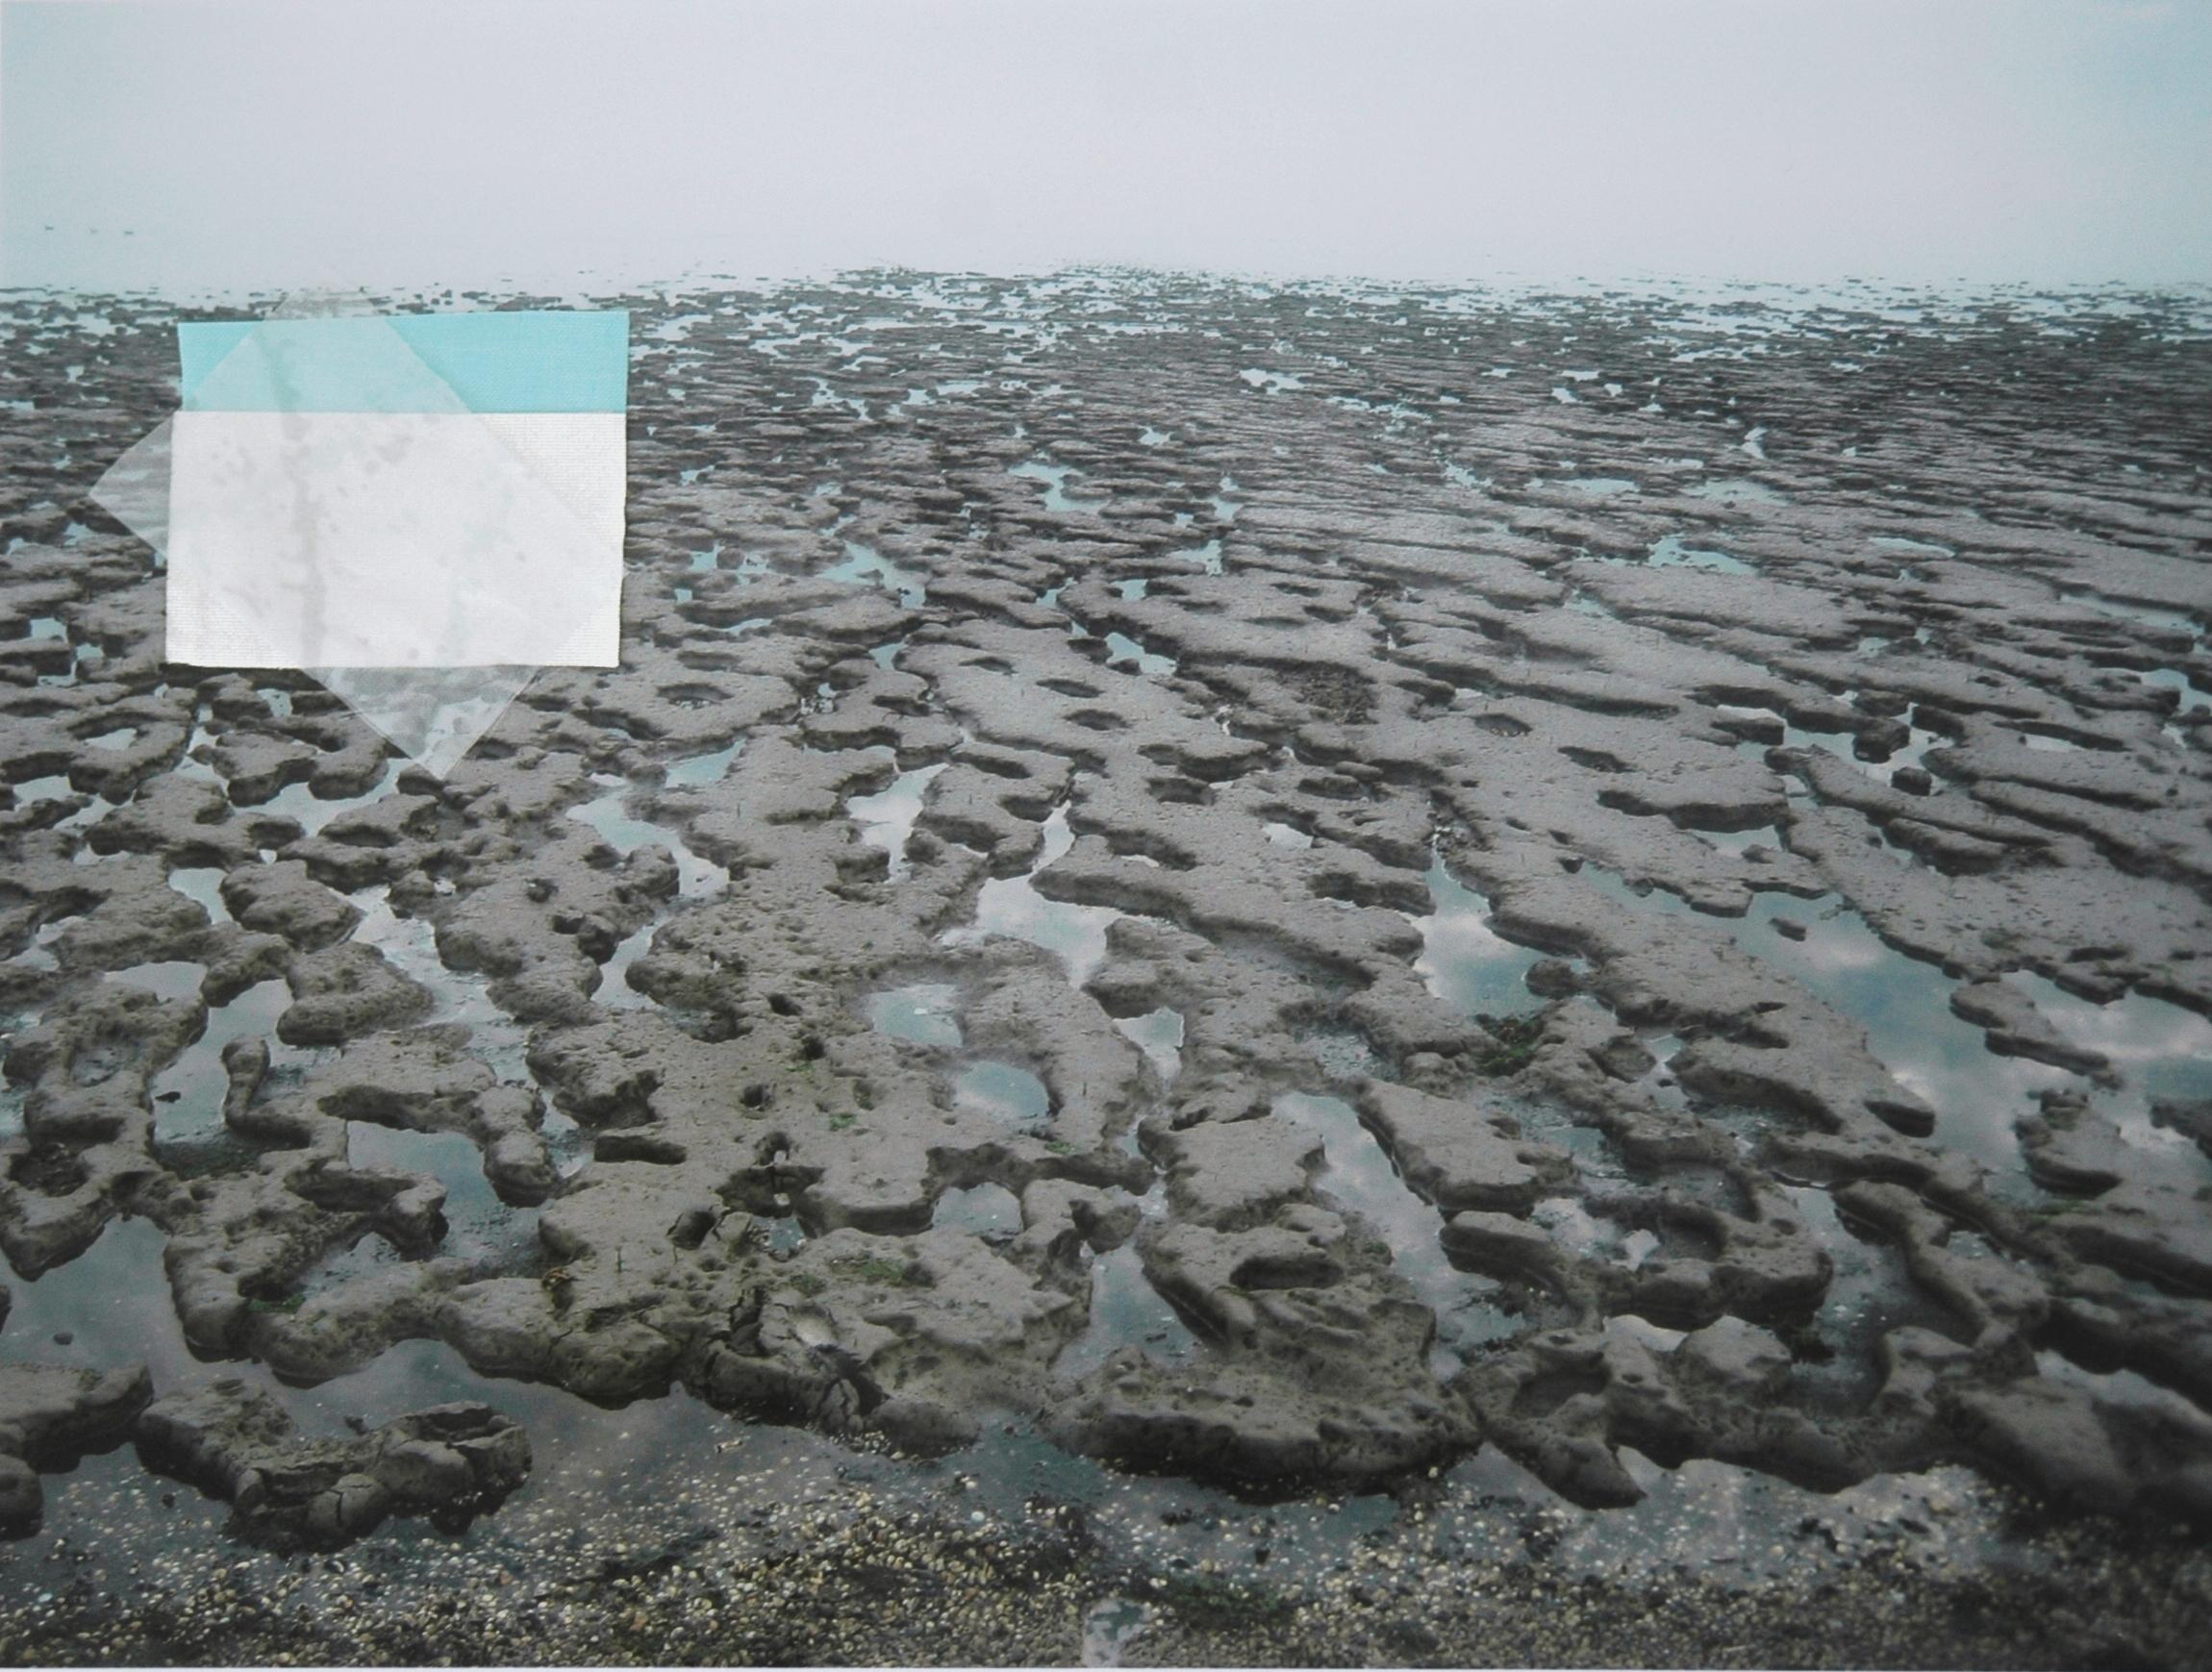 Waddenzon 2015, textiel, foto, 40x30 cm